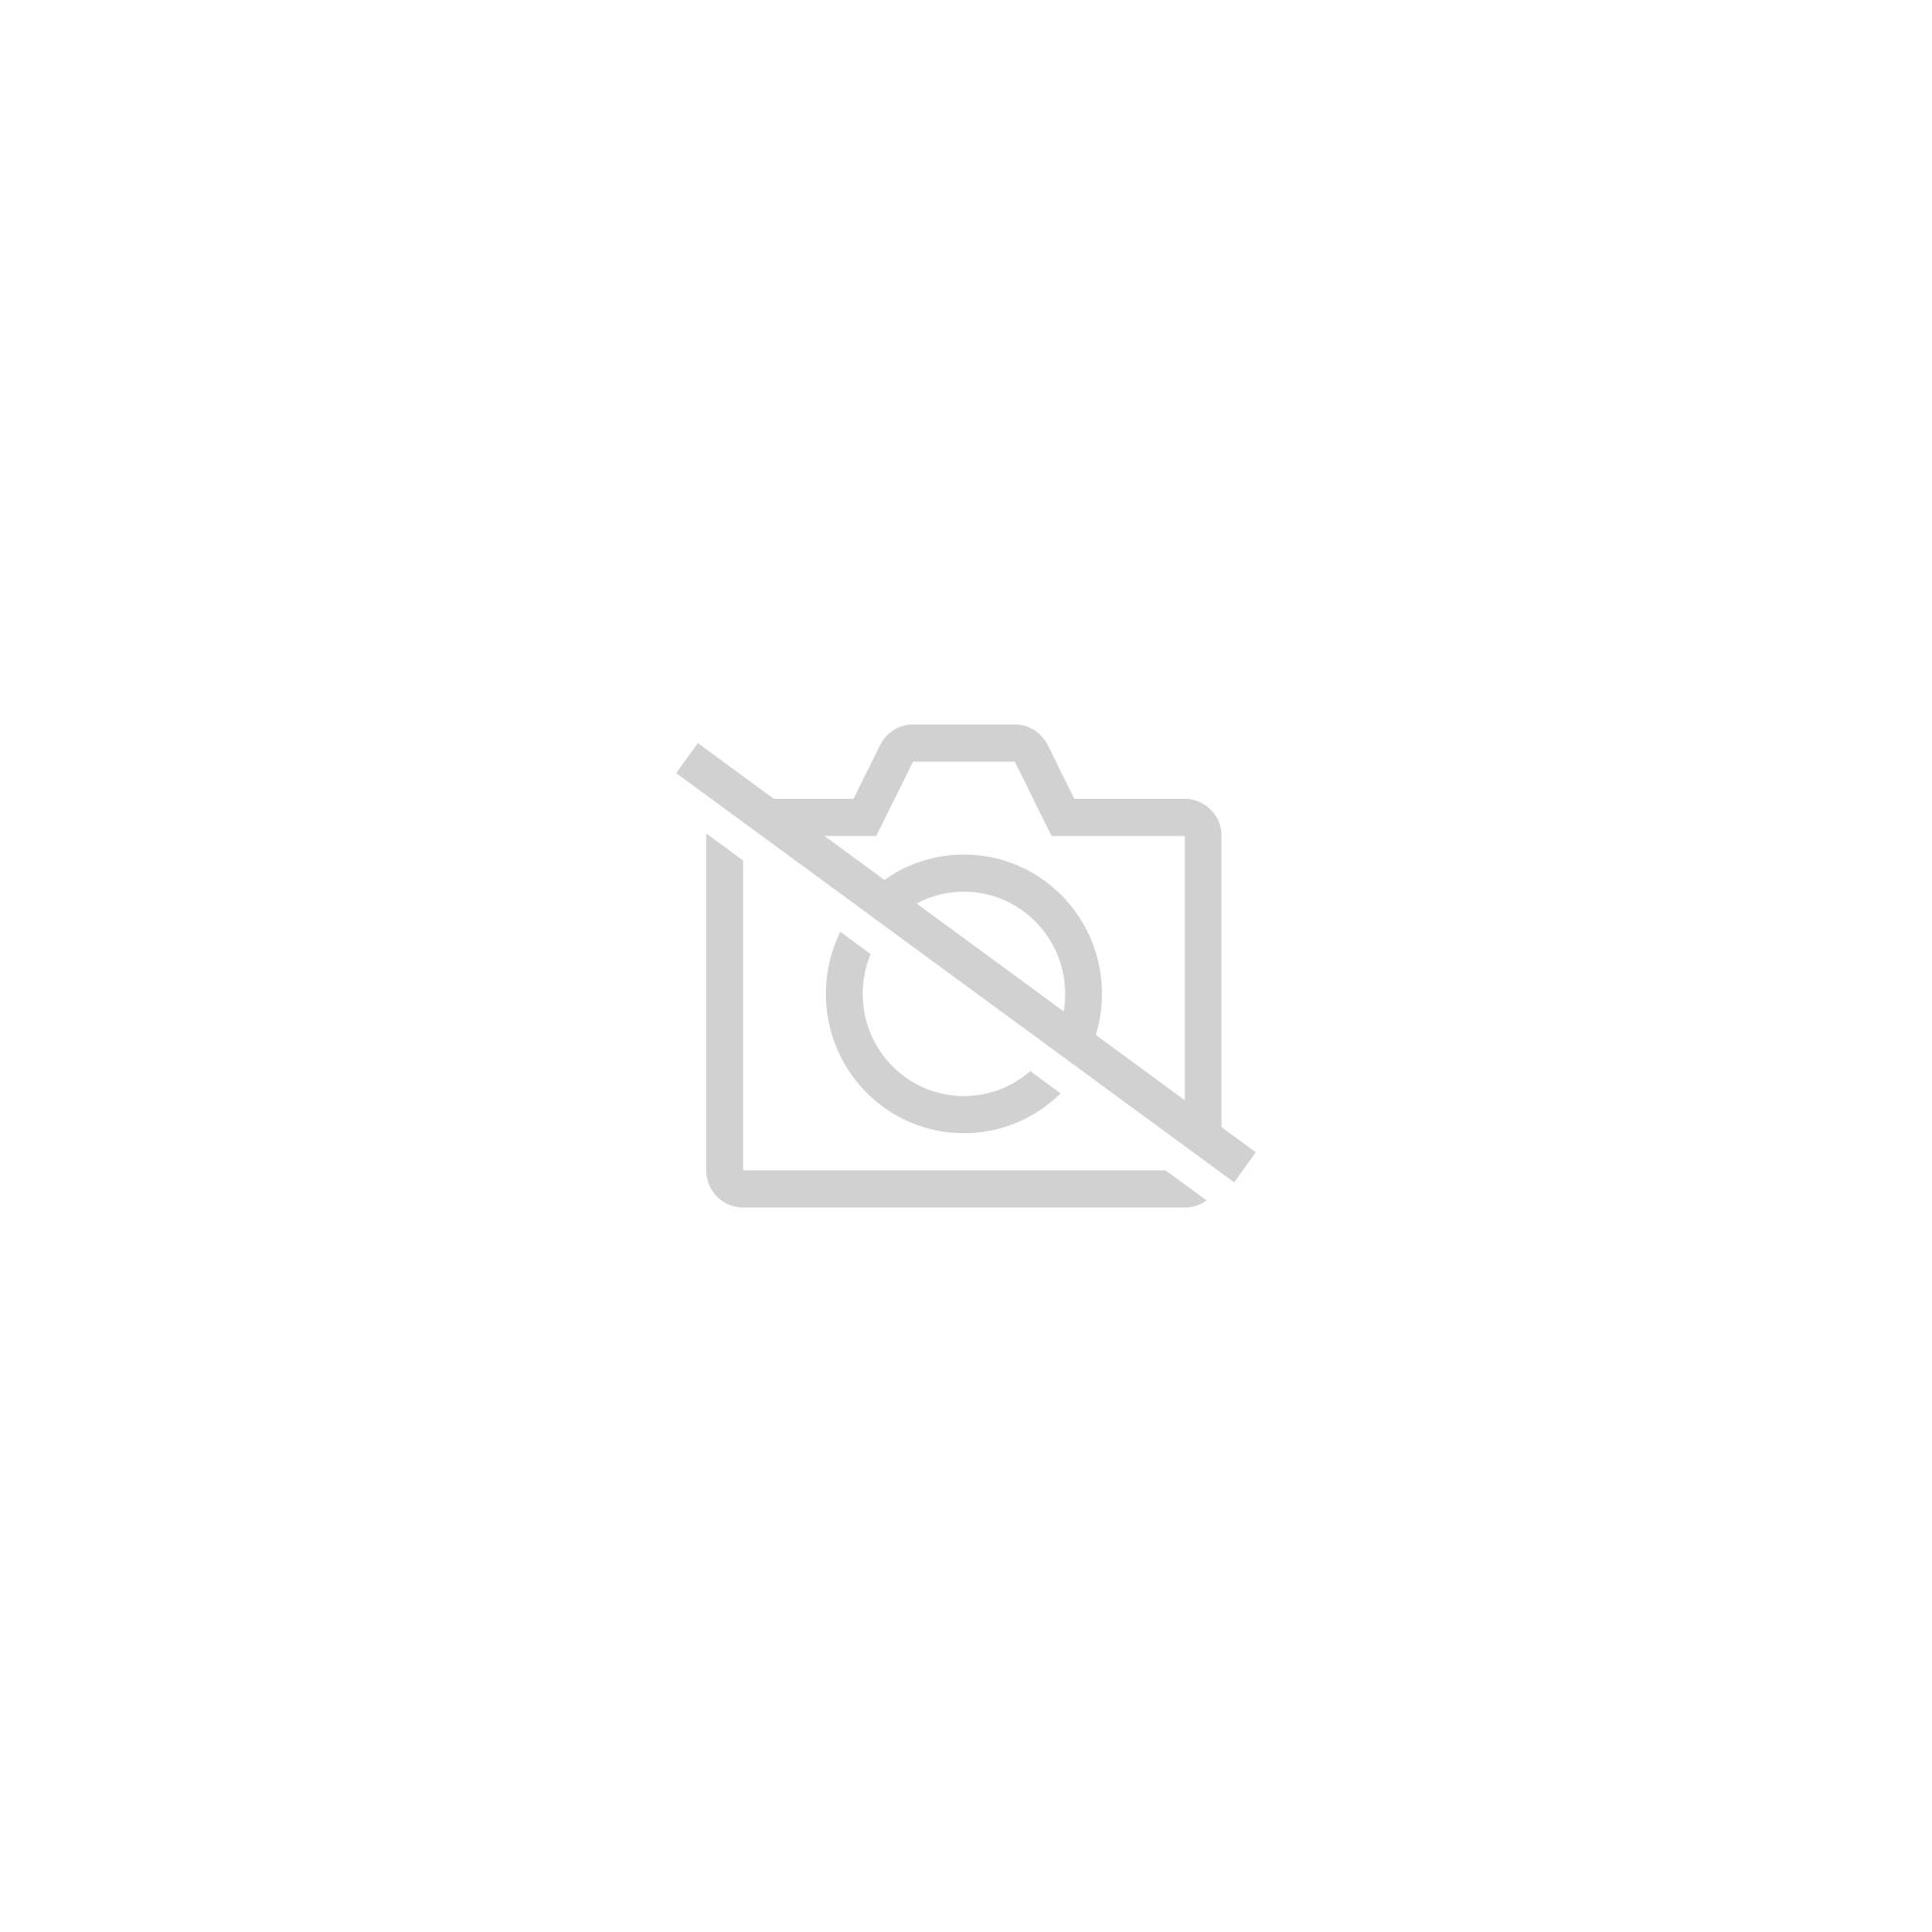 Plume Playmobil ref 173